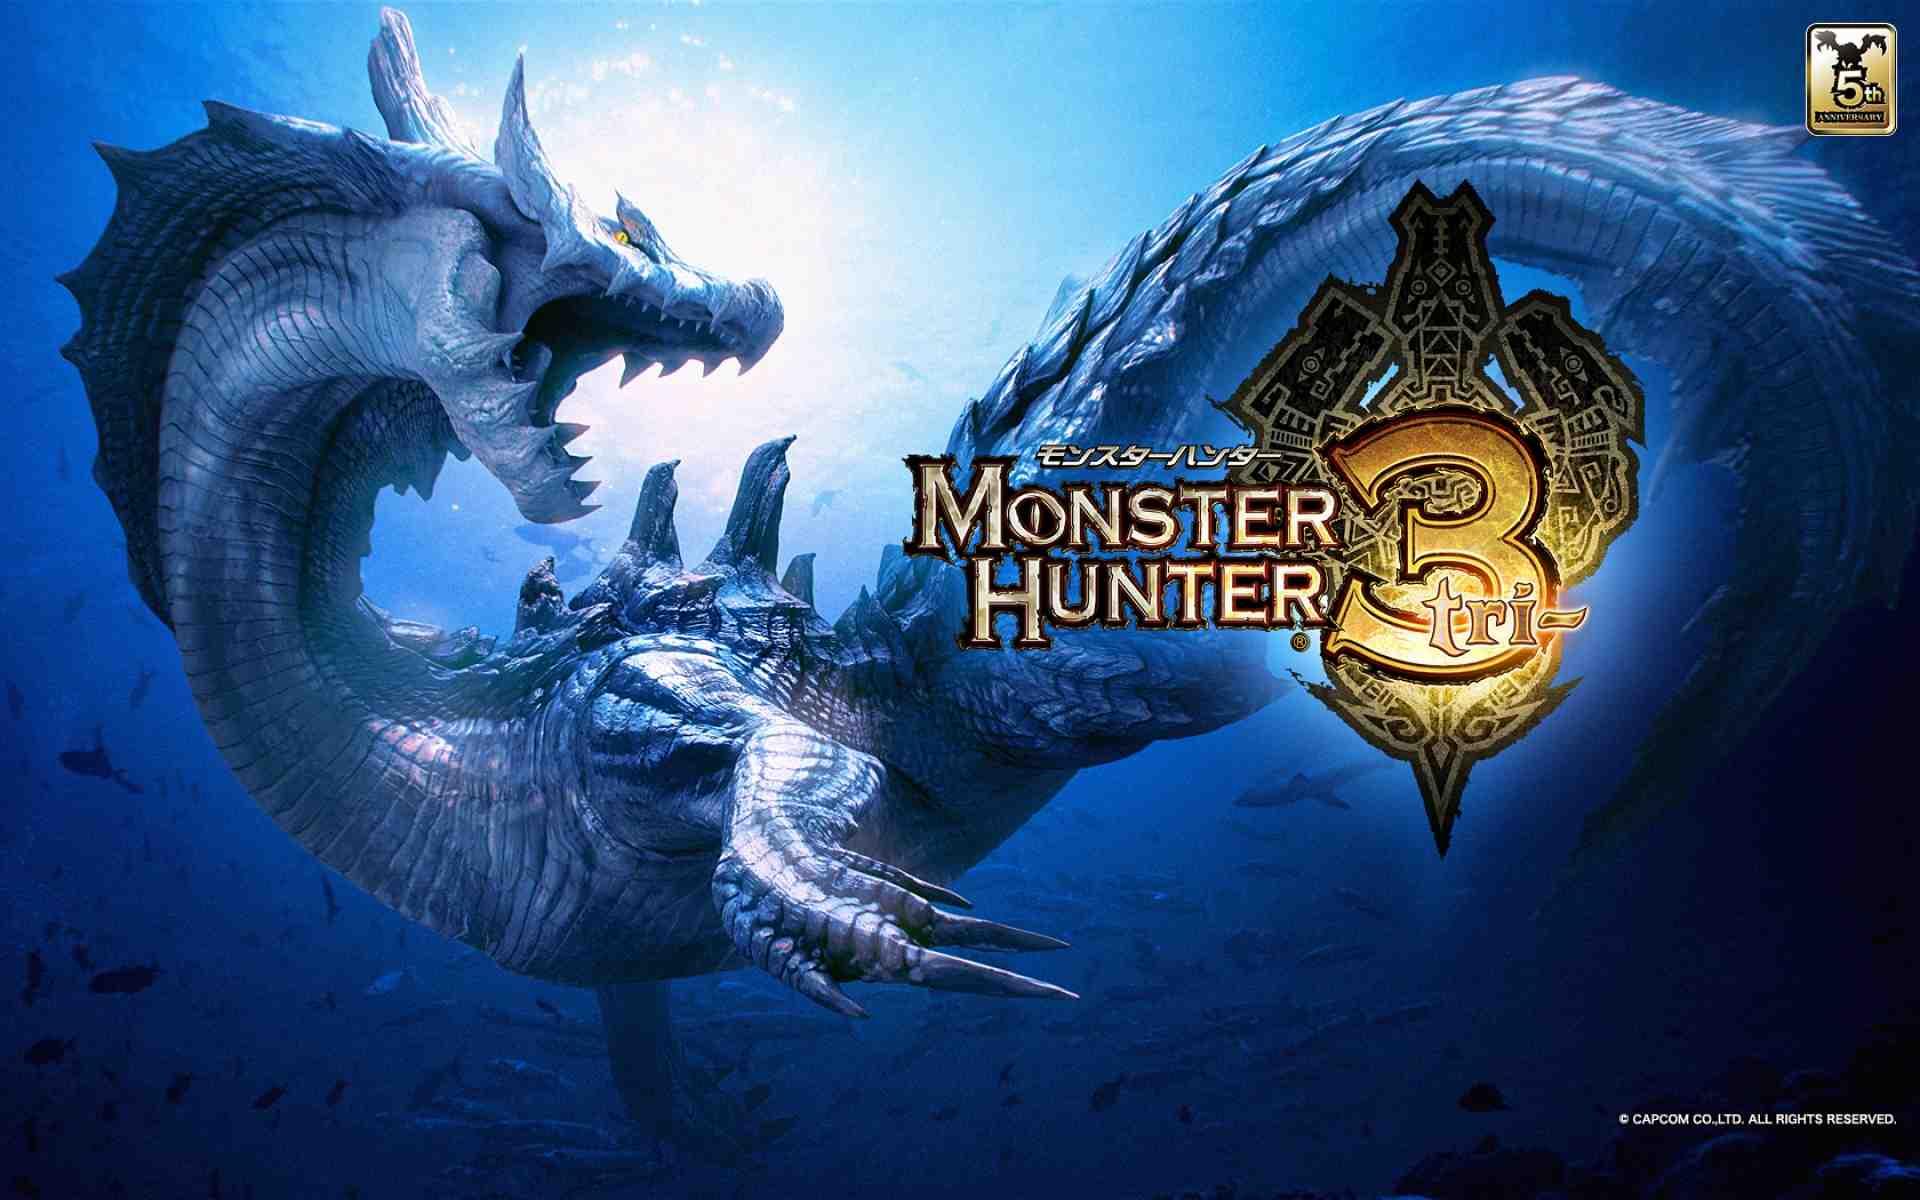 Capcom confirms Monster Hunter not coming to PS Vita